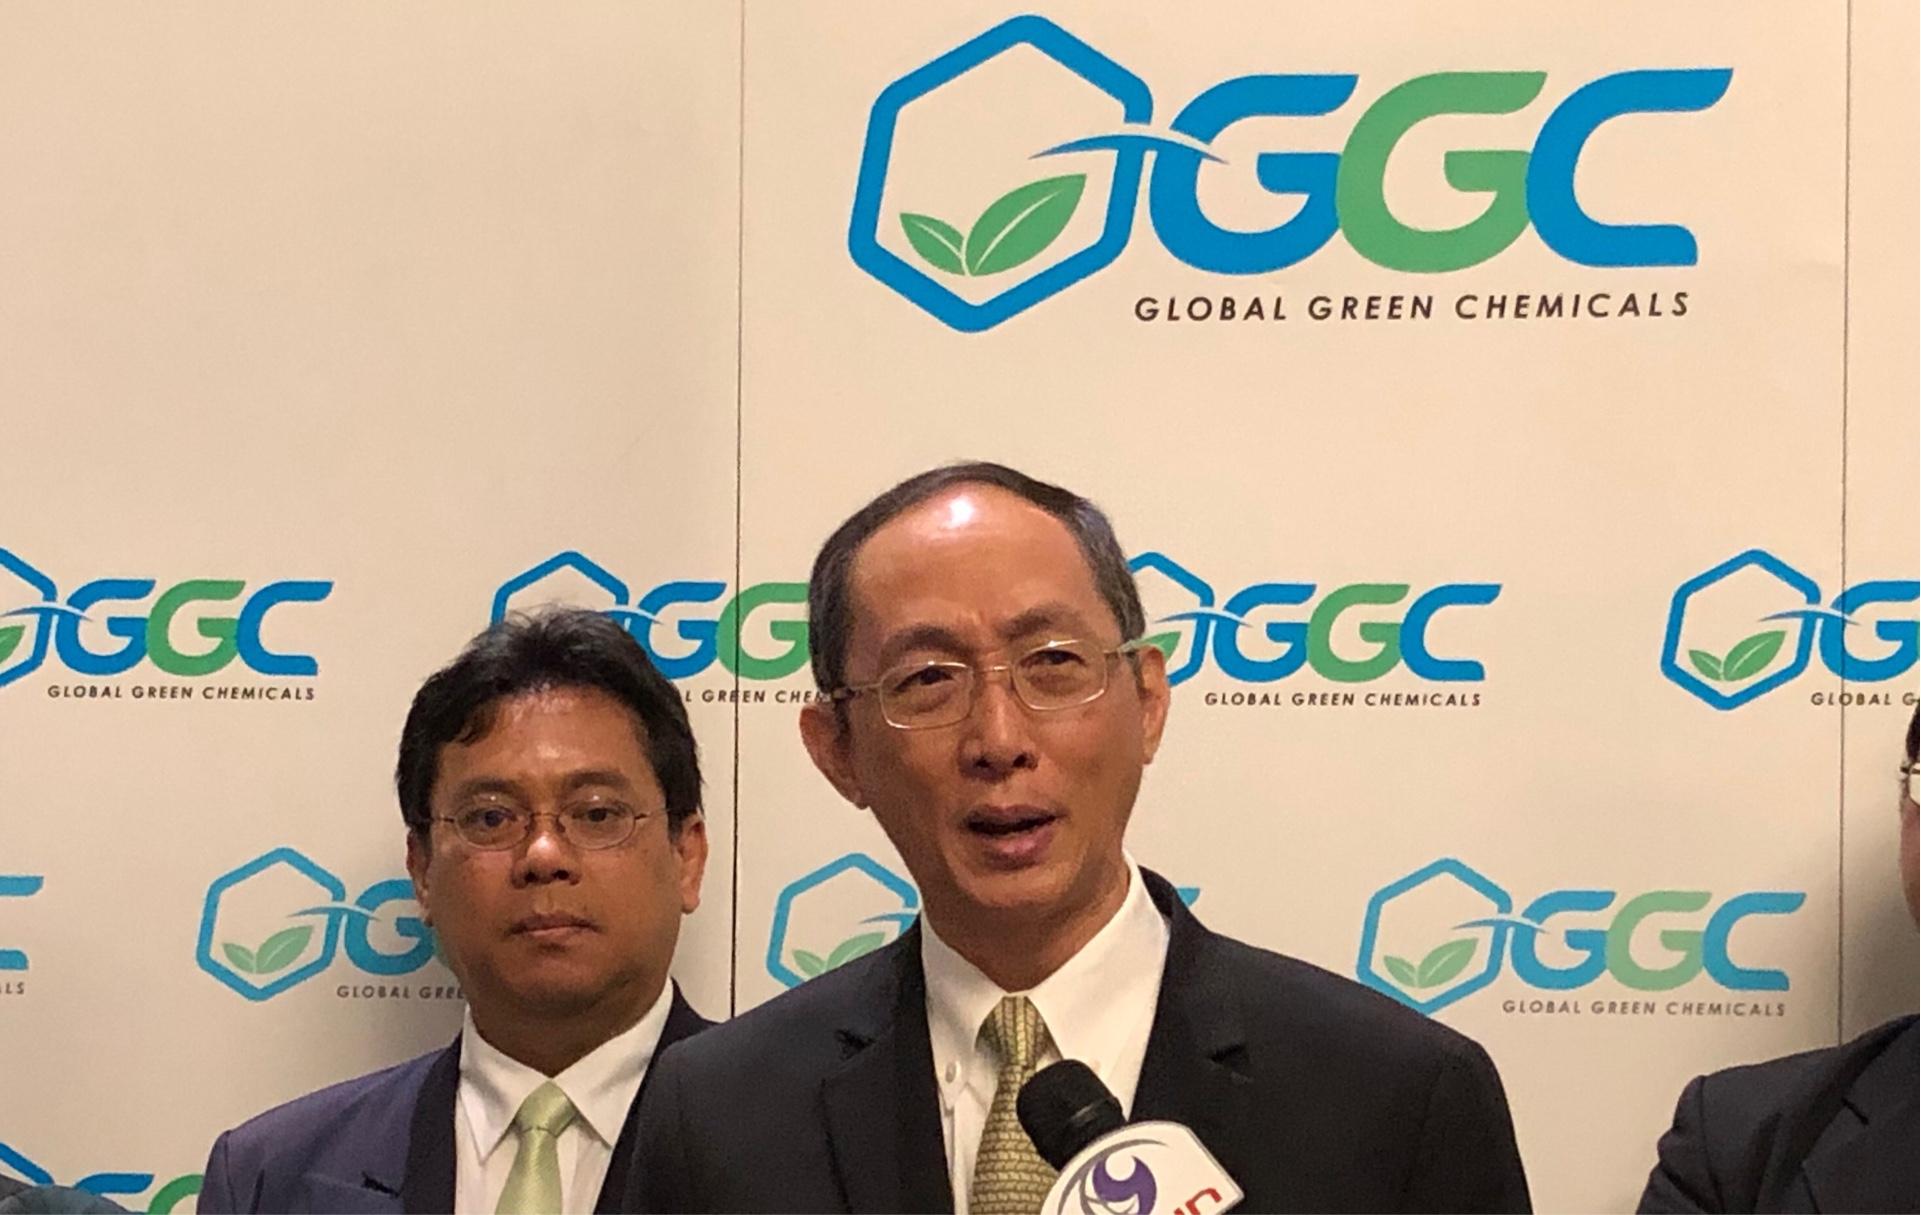 GGCมั่นใจ3ไตรมาสกำไรดีขึ้น เช่าโรงกลั่นRPCผลิตวัตถุดิบทำB100